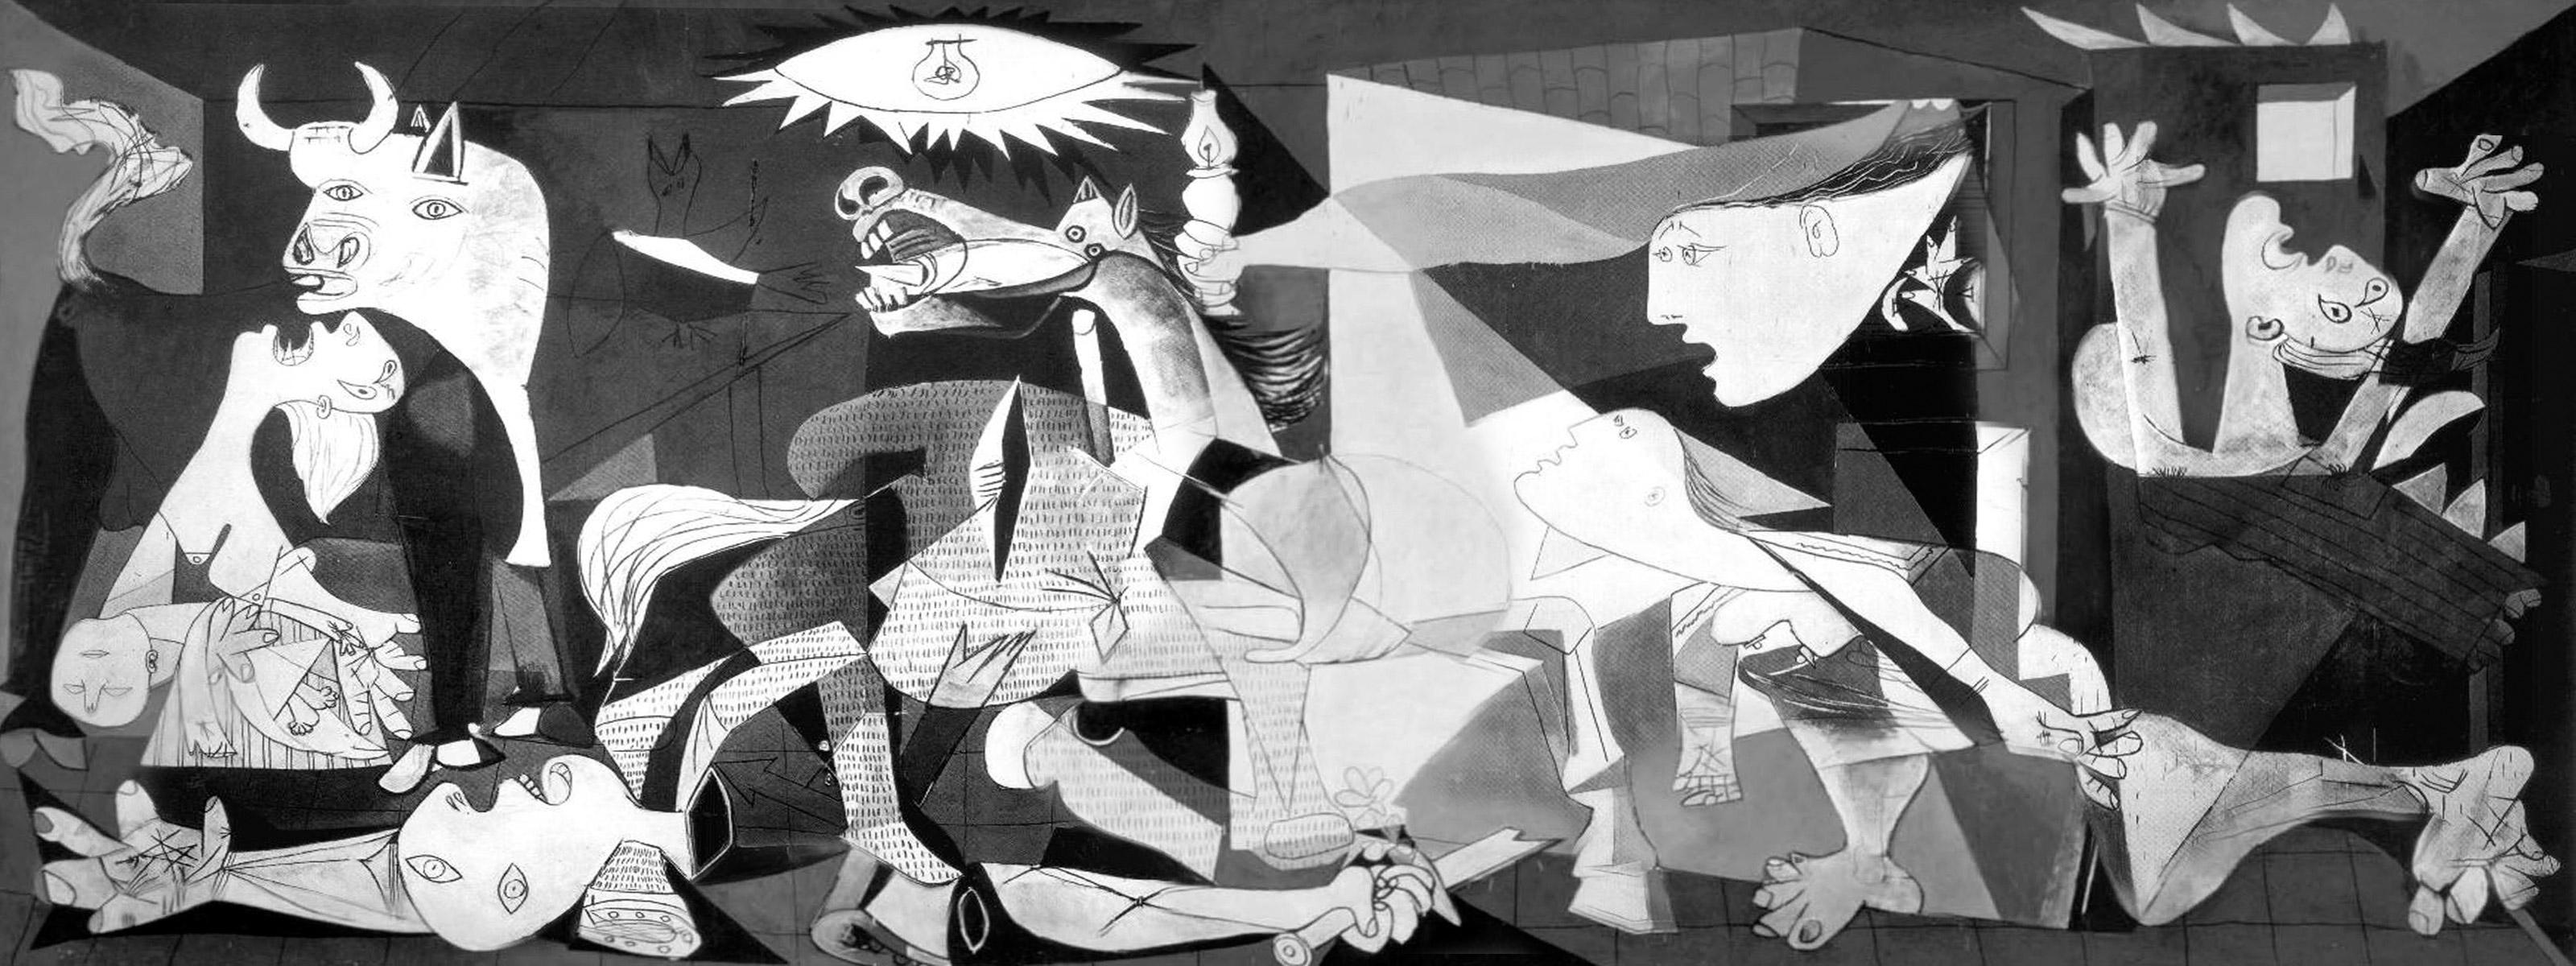 """Guernica"", Pablo Picasso, 1937"